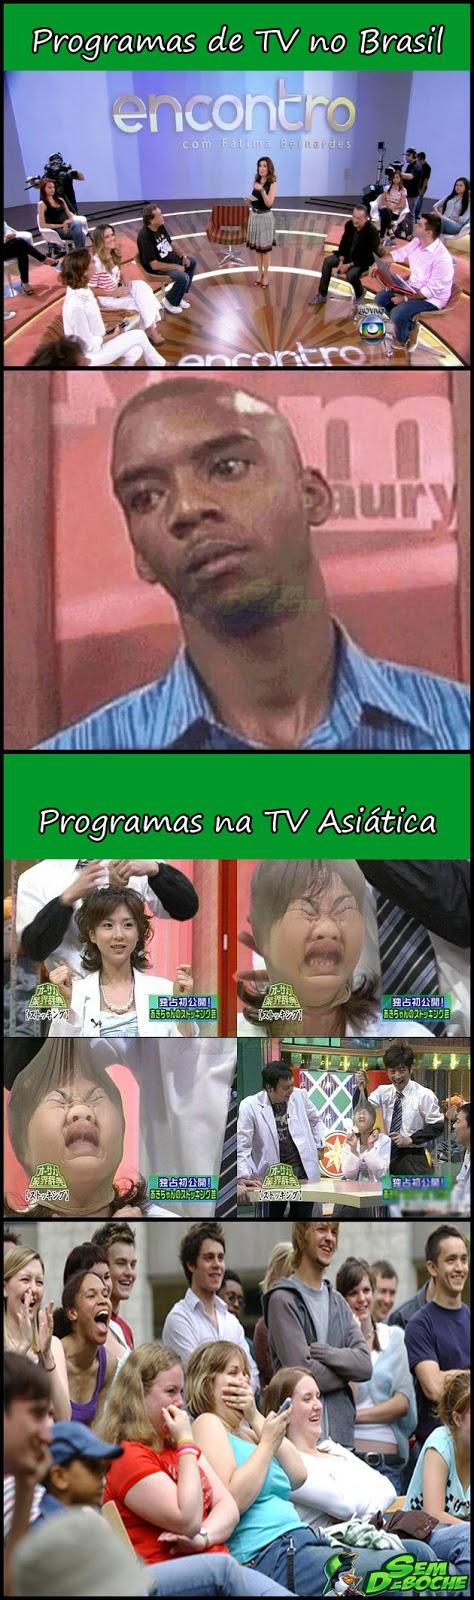 TV BRASILEIRA VS TV ASIÁTICA